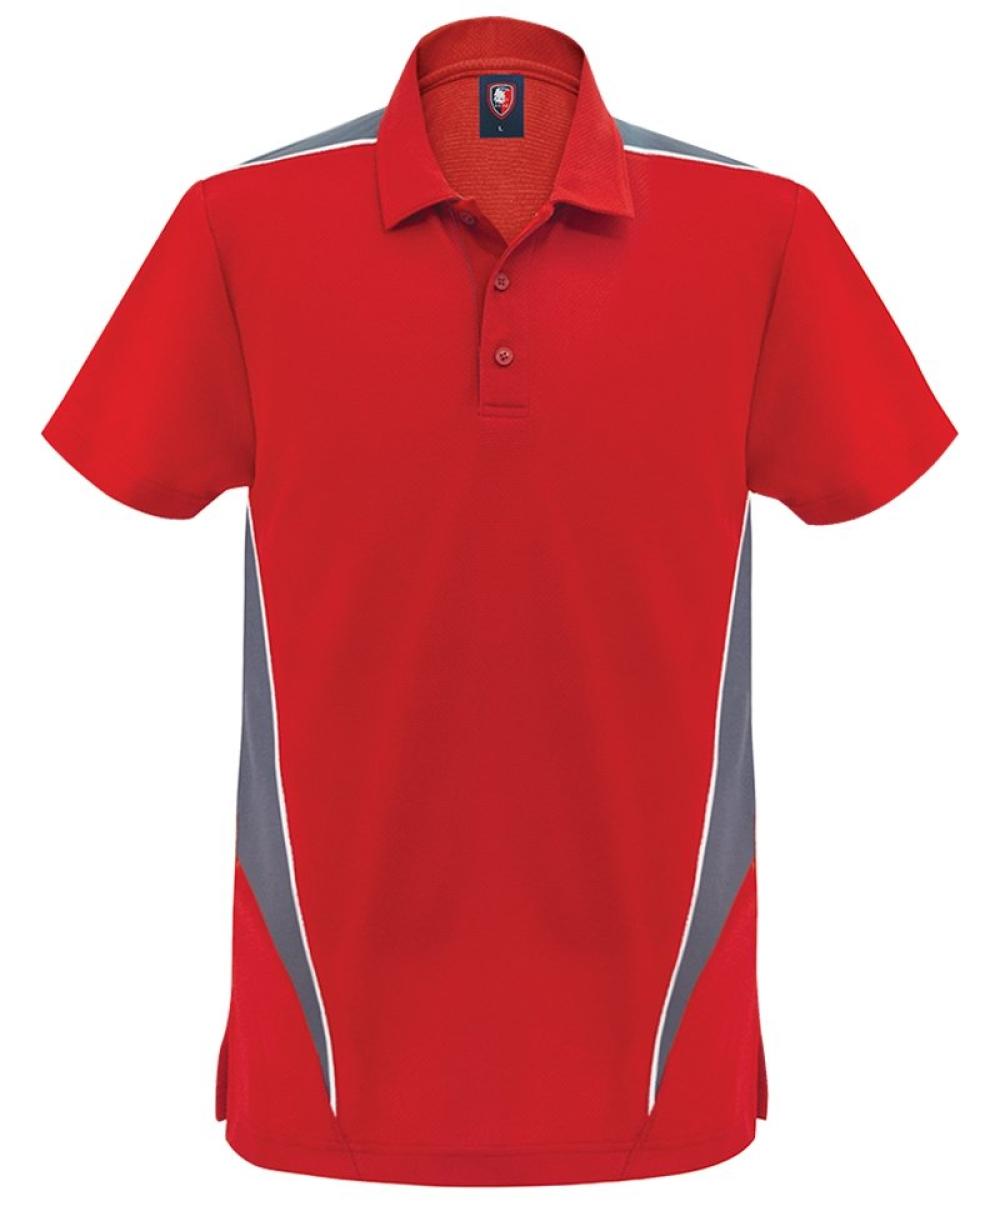 DF-129 Unisex (Slim Fit) + Colors 100% Microfibre T-Shirts Johor Bahru (JB), Kuala Lumpur (KL), Malaysia Supplier Supply Manufacturer | M-Novo Marketing Sdn. Bhd.